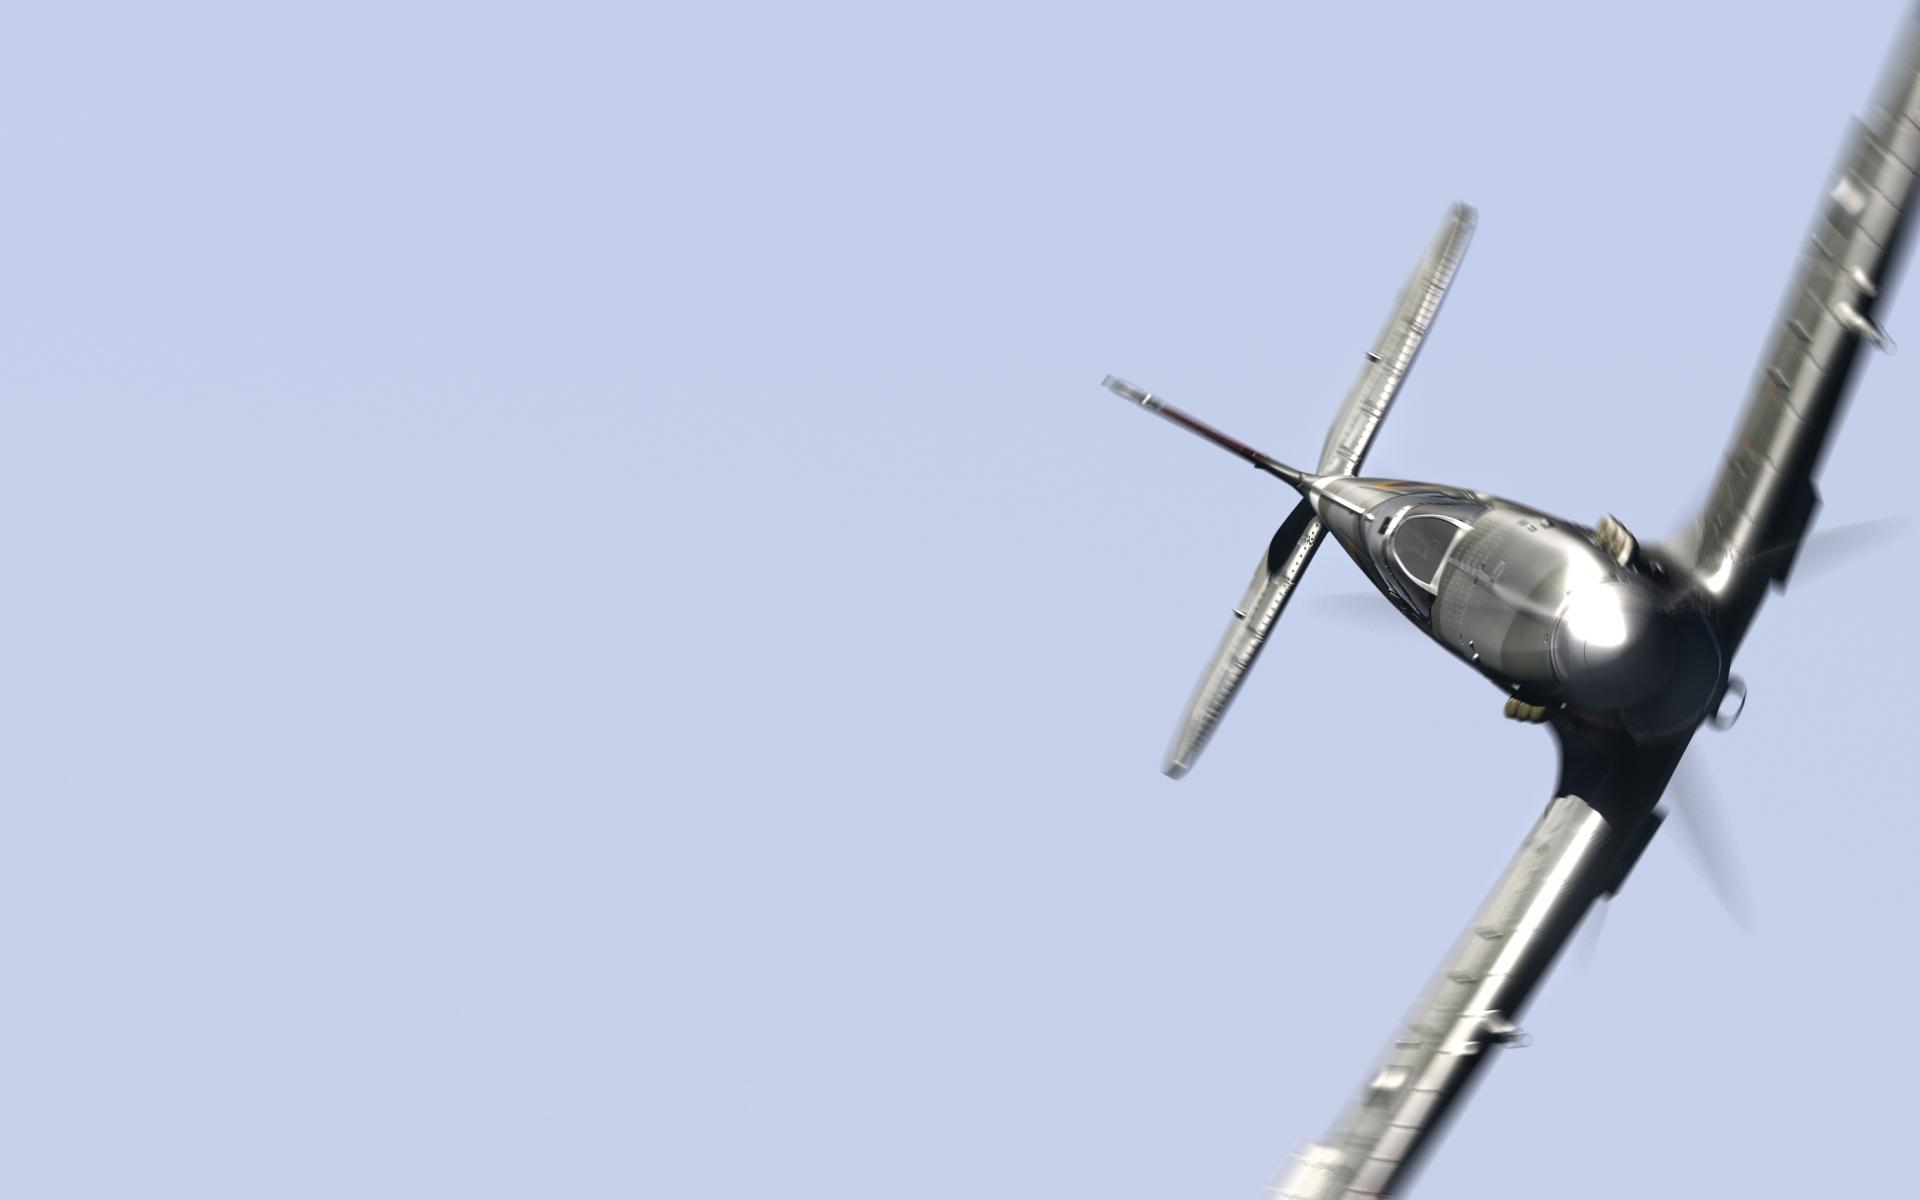 supermarine spitfire 4096x1743 wallpaper Art HD Wallpaper download 1920x1200